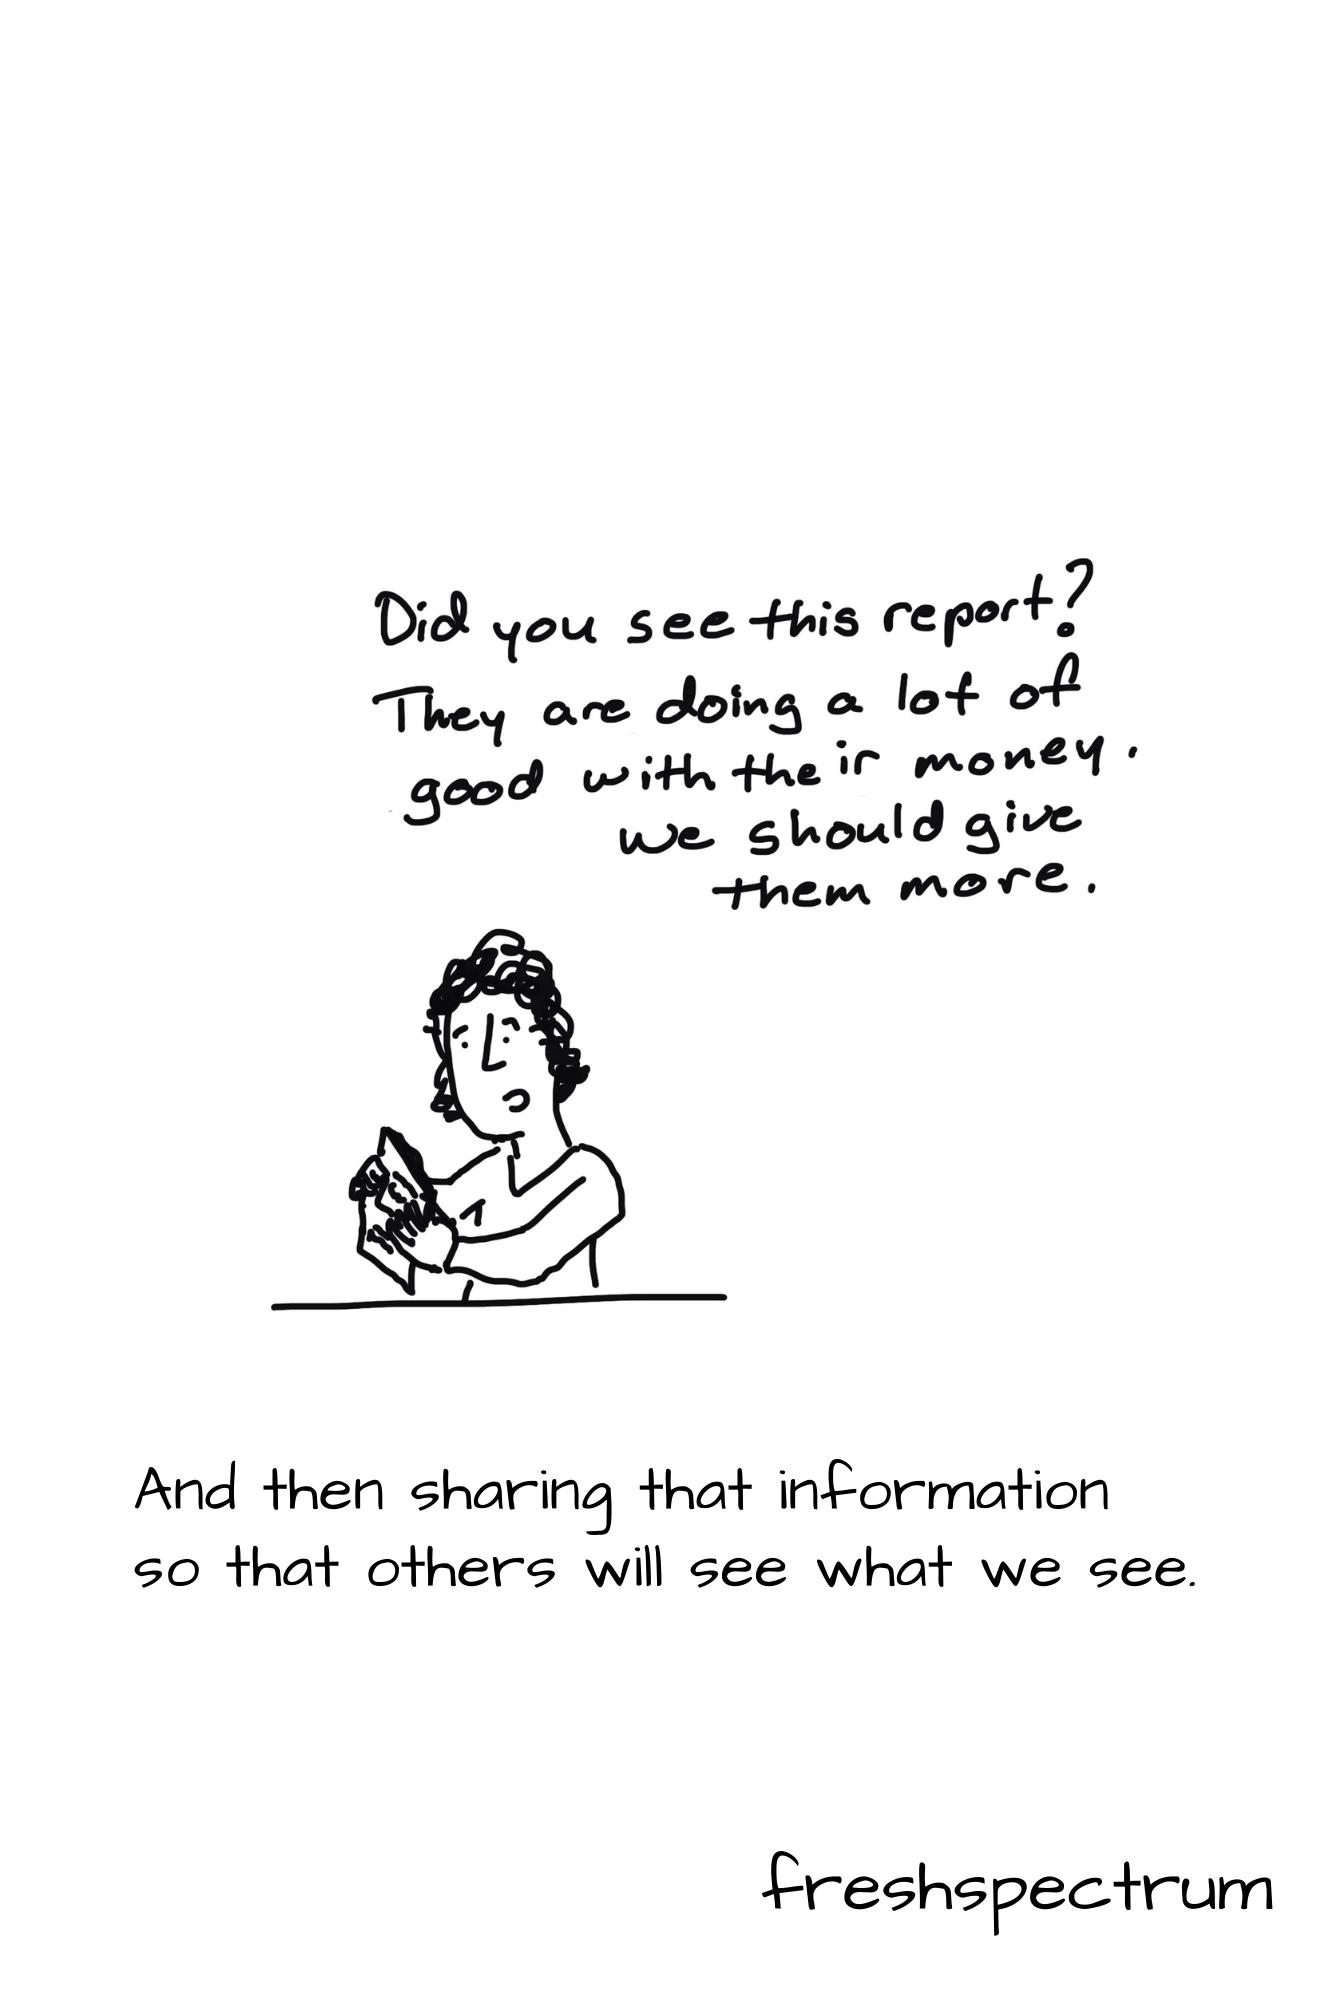 Shrodinger's Outcome Graphic Novella by Chris Lysy of freshspectrum.com.  Illustration 16.